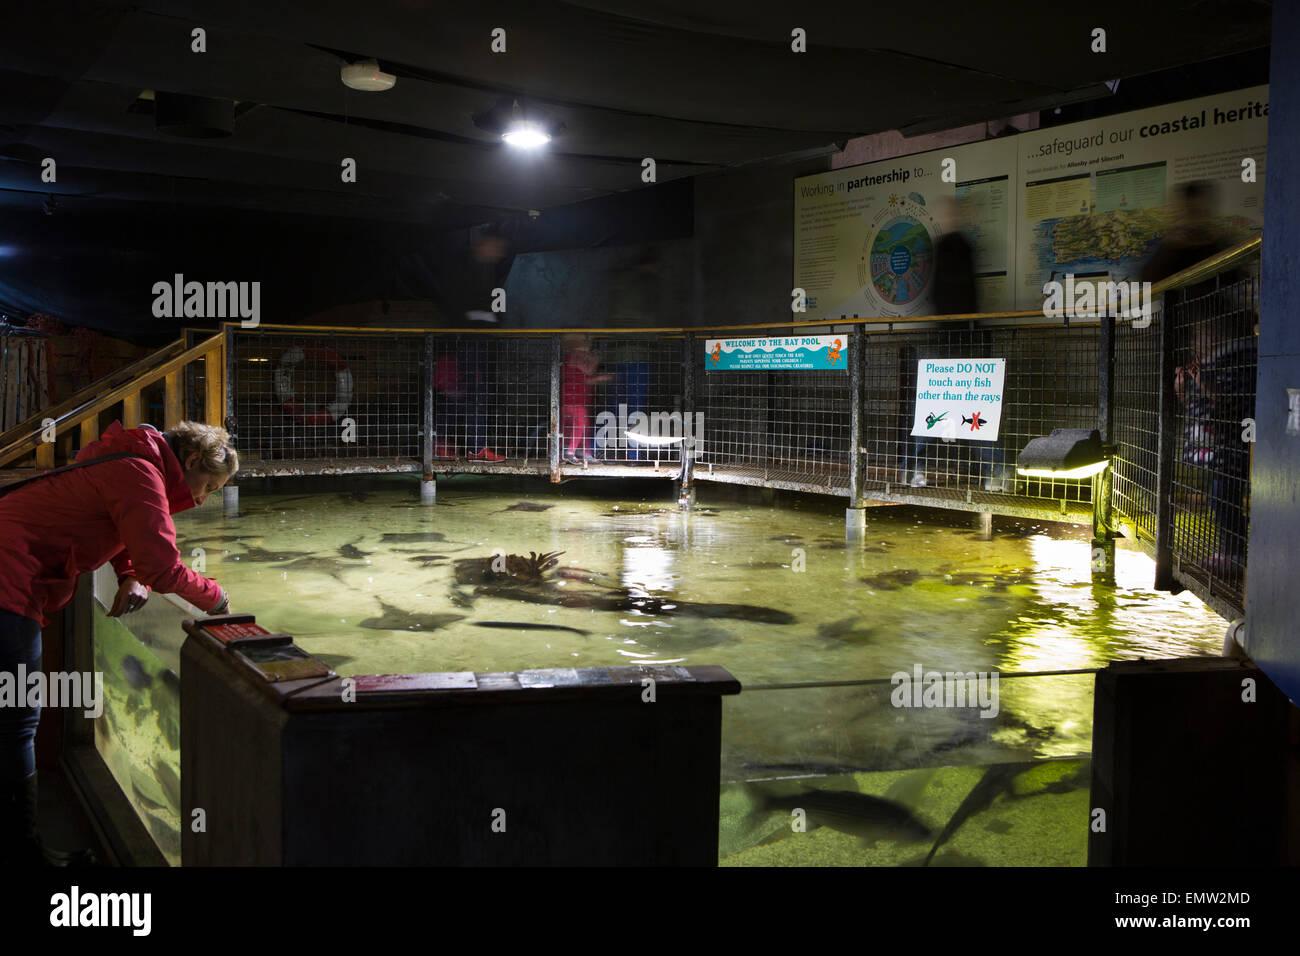 UK, Cumbria, Maryport, Coast Aquarium, child-friendly ray tank - Stock Image